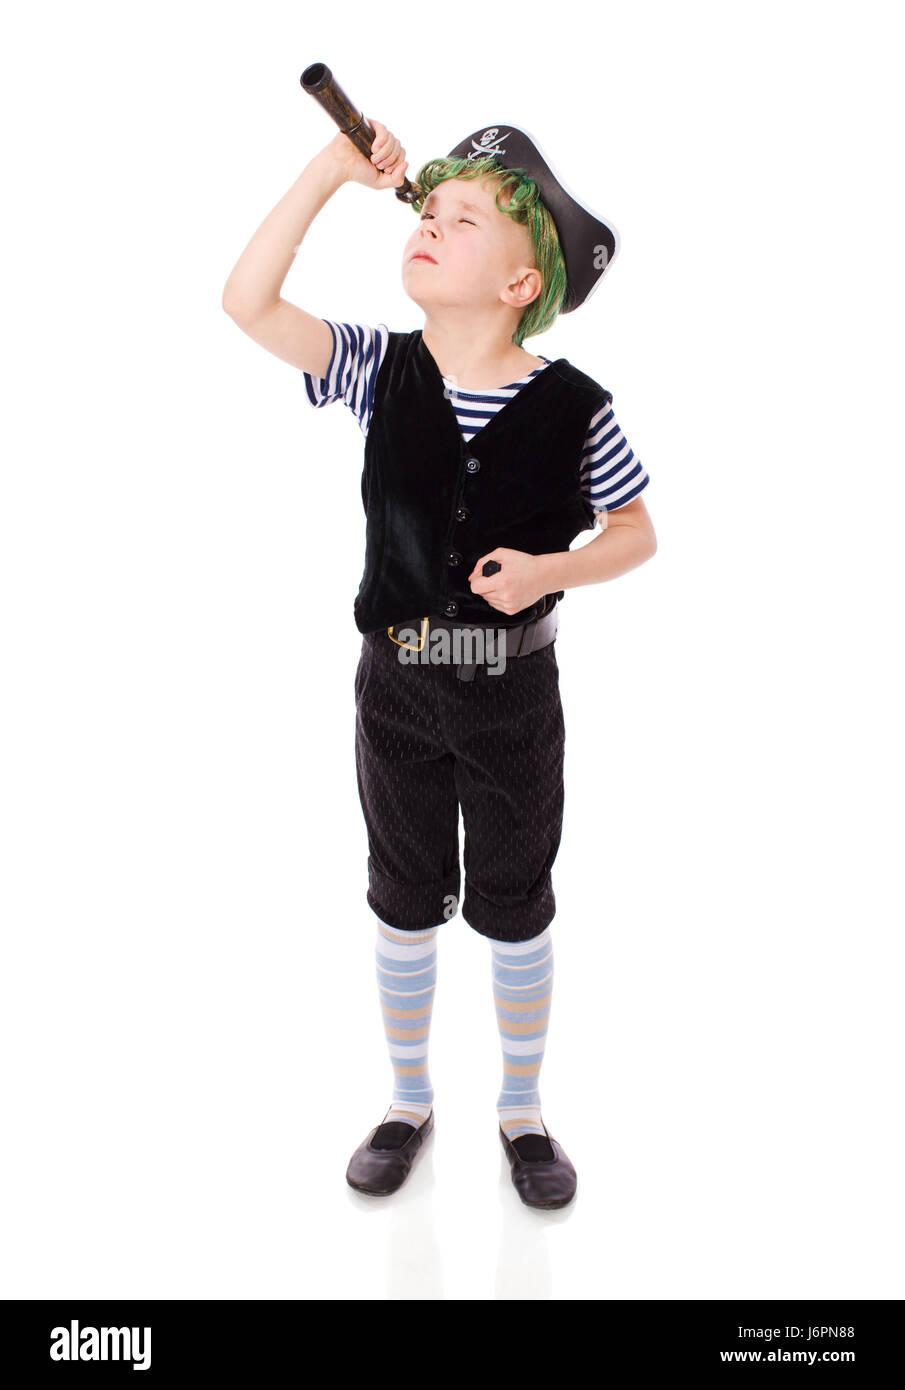 Boy wearing pirate costume holding knifes isolated on white Stock Photo